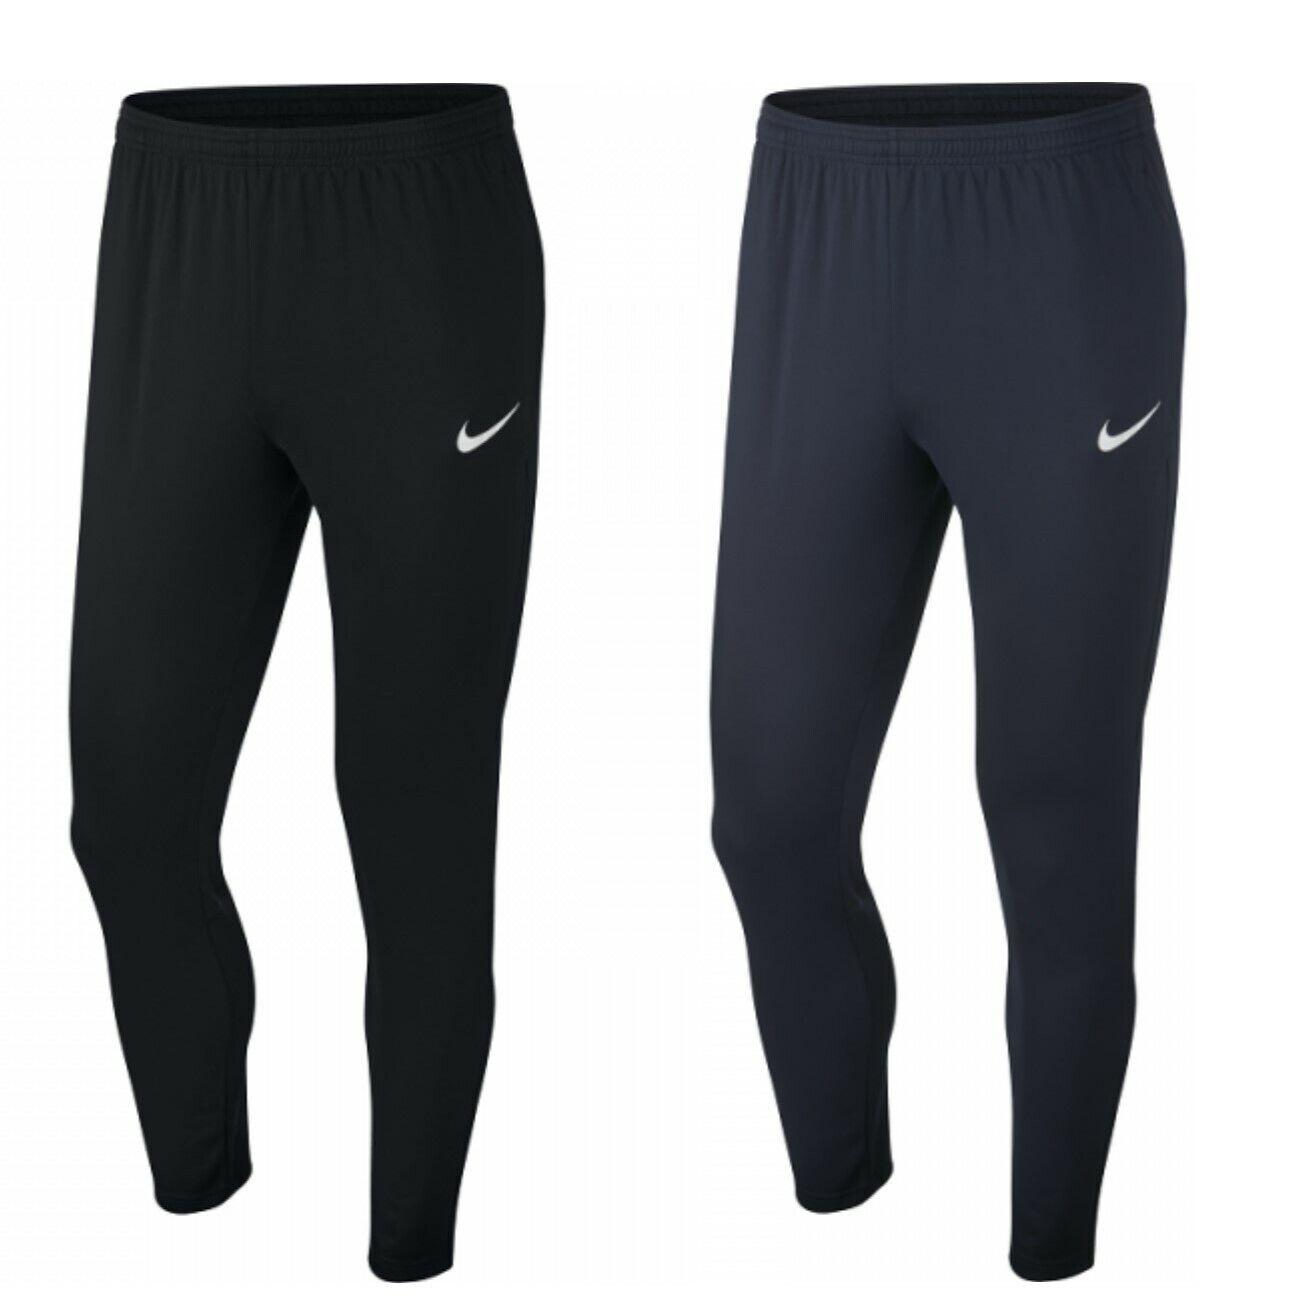 b9bf22c9aba306 Nike Jogginghose Herren Tech Pant Trainingshose Jogginghose RV Taschen lang